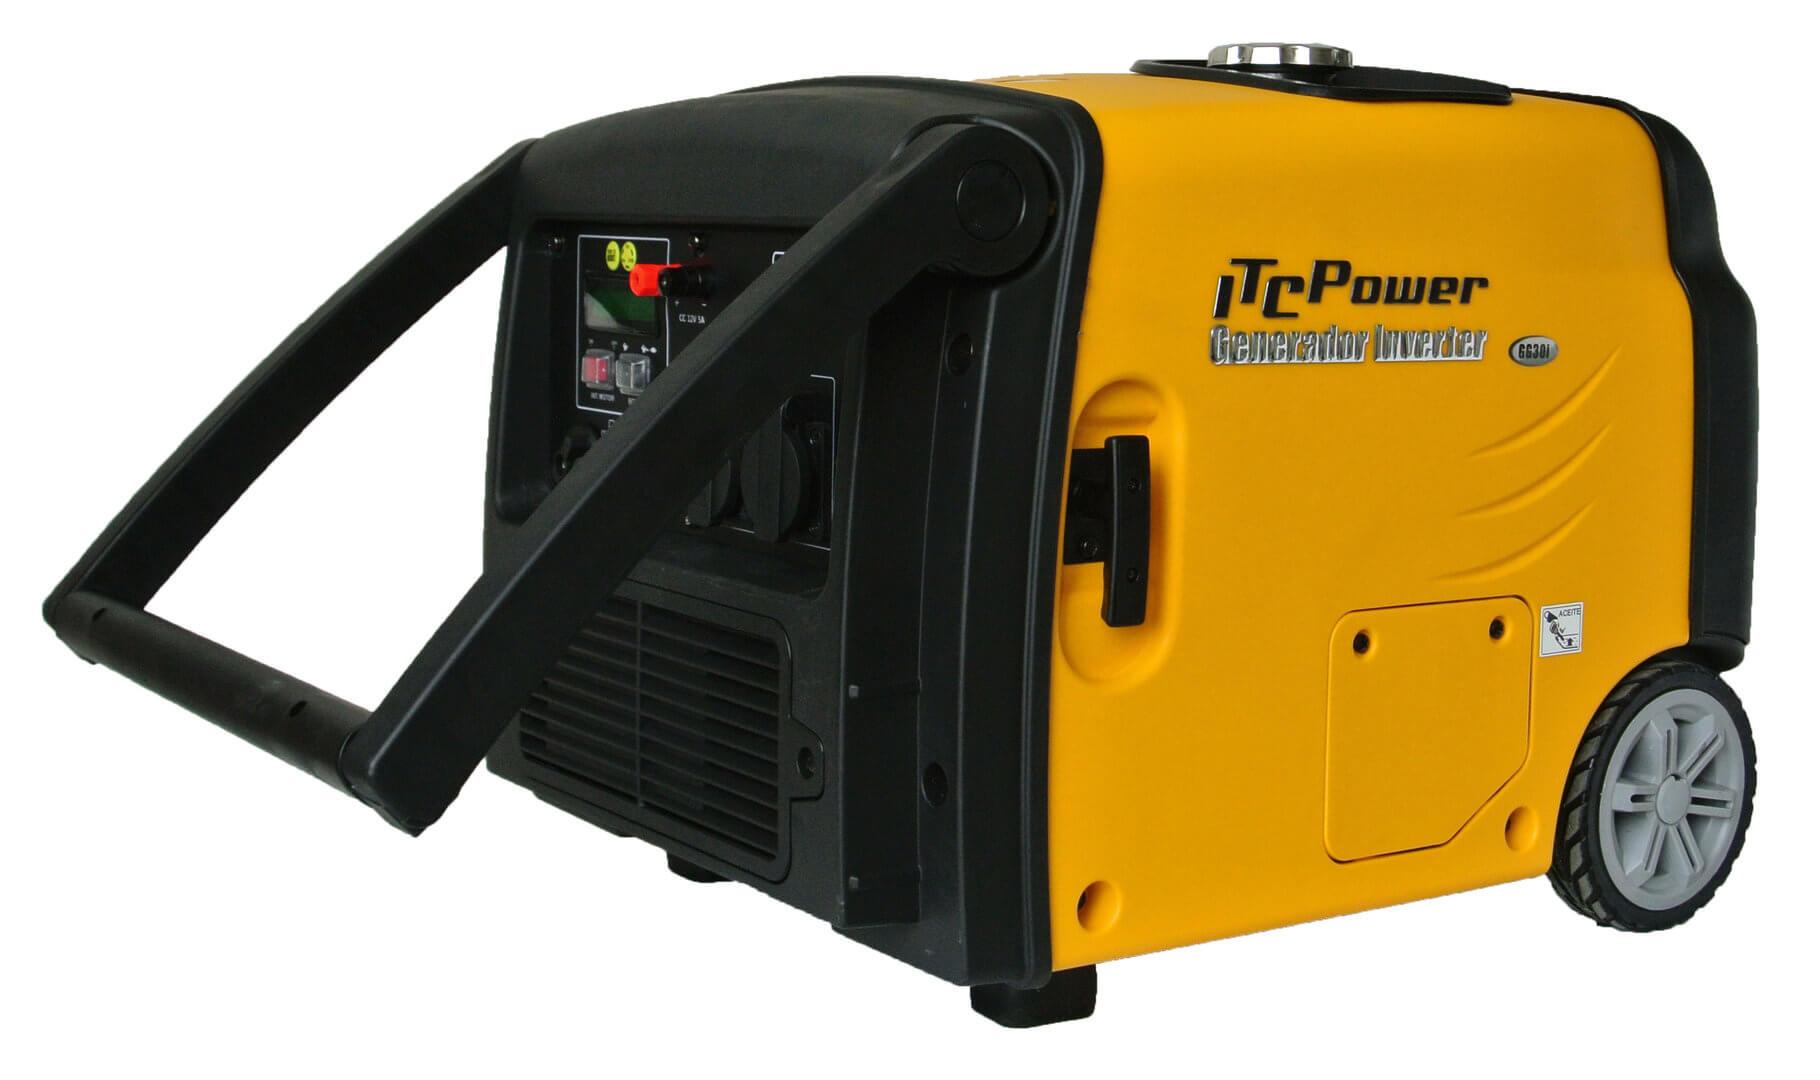 GENERADOR InverterITCPOWER 3200 w